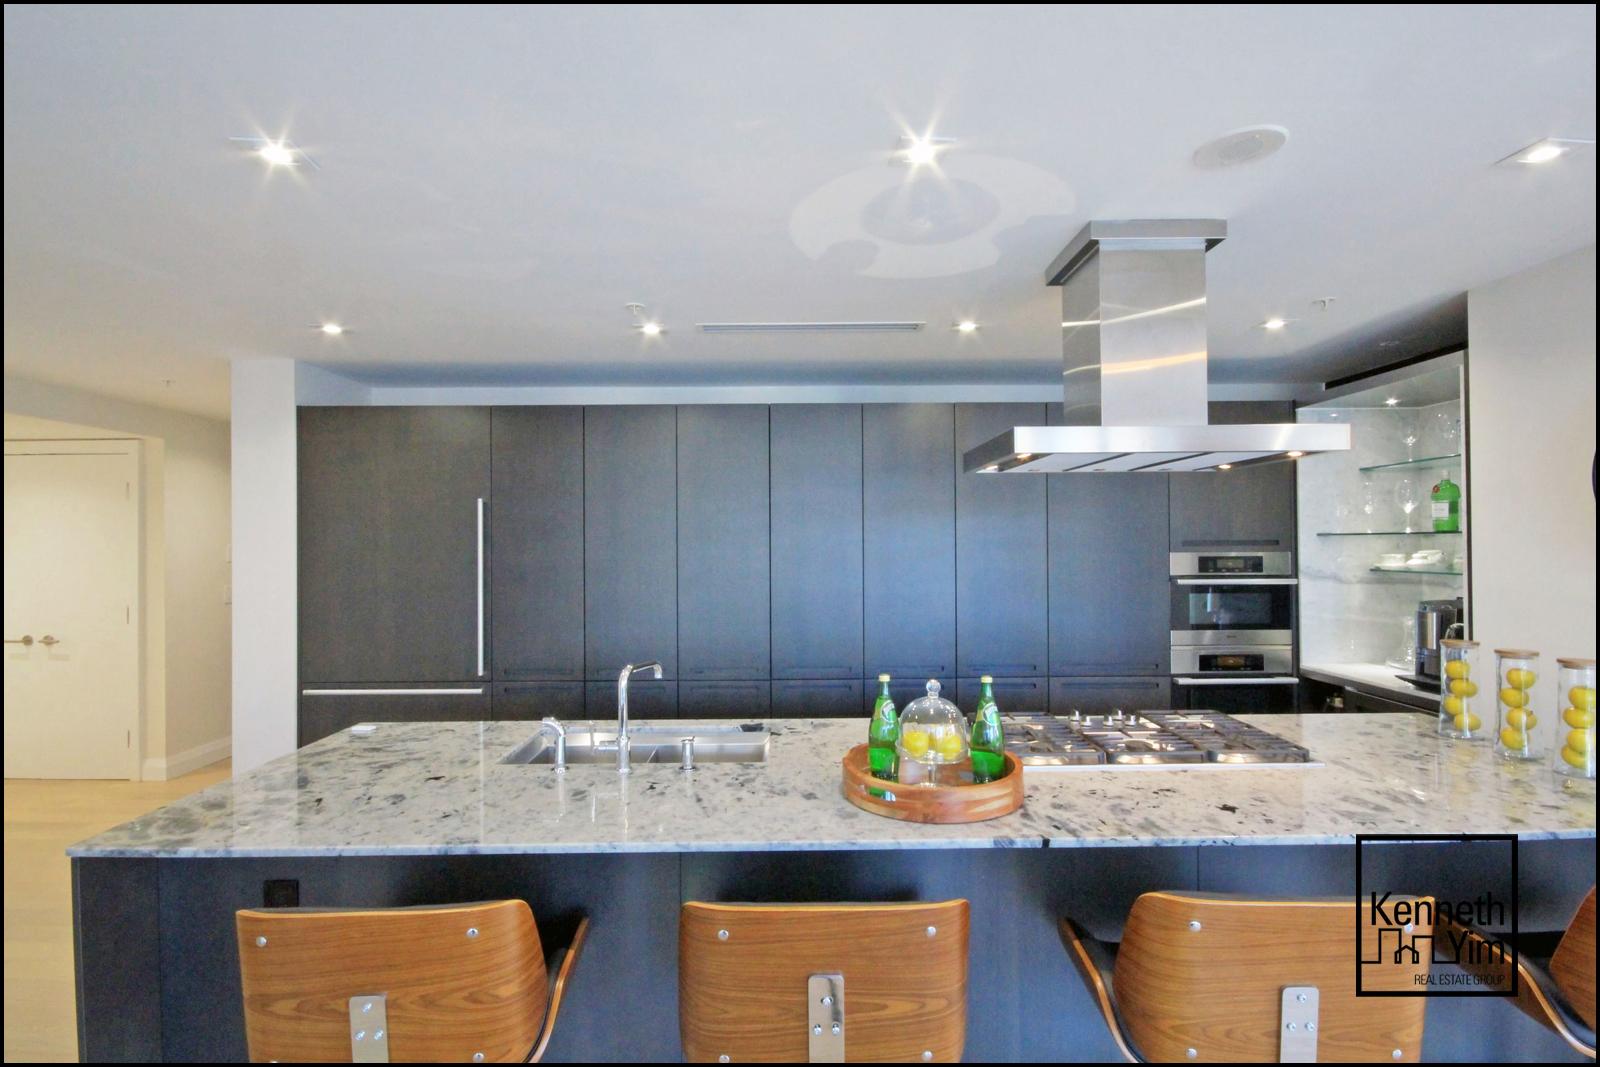 11 - Kitchen Front Shot - IMG_0916_7_8.jpg